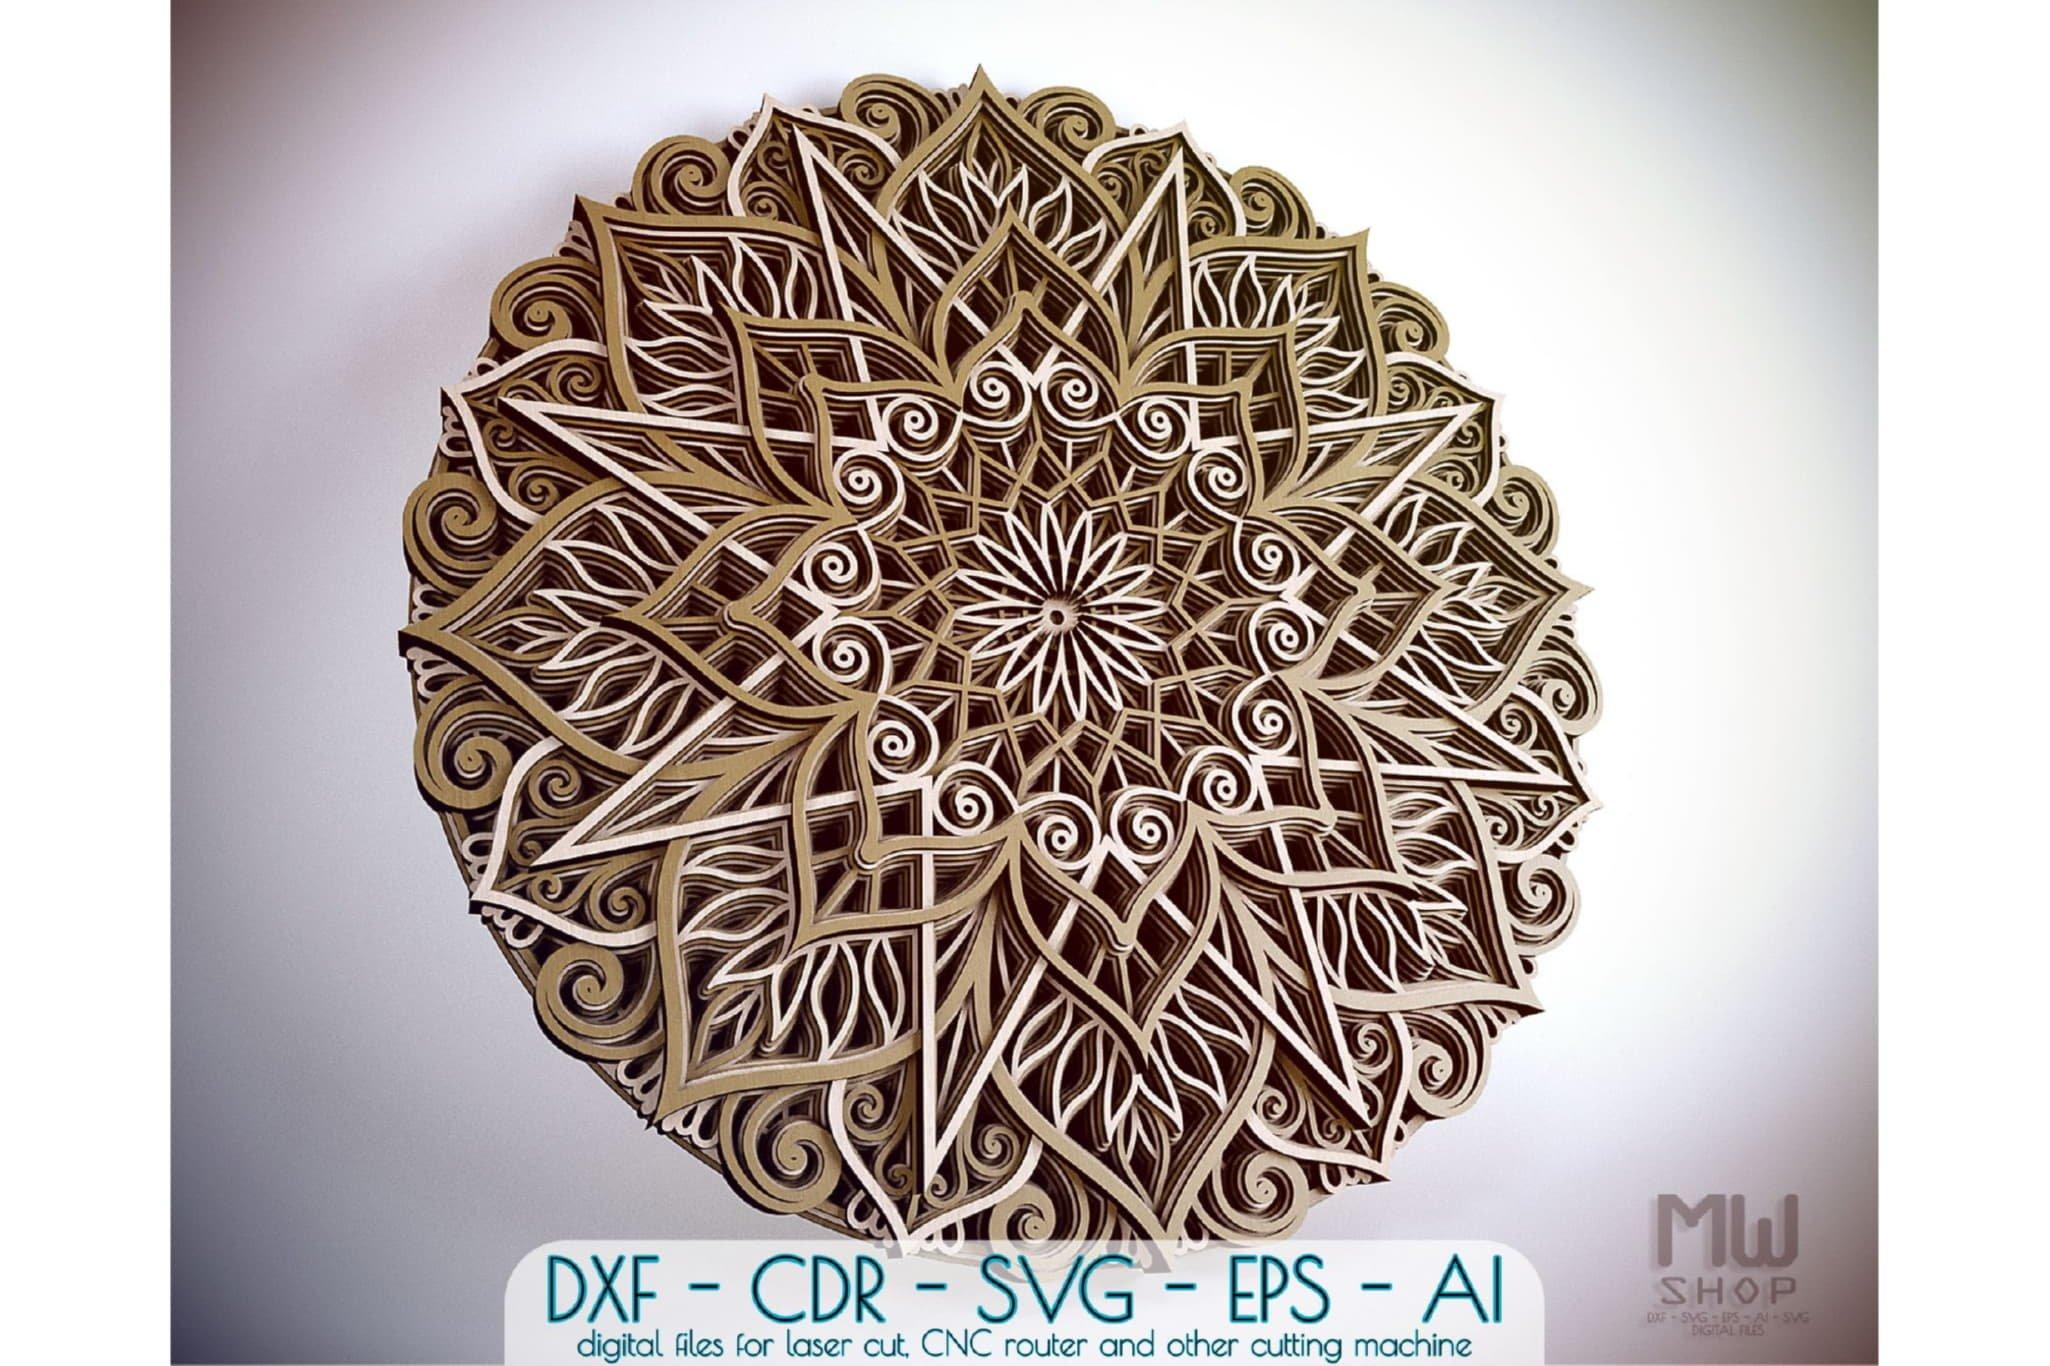 M89 - Mandala DXF Laser Cut Pattern, Flower mandala pattern example image 1